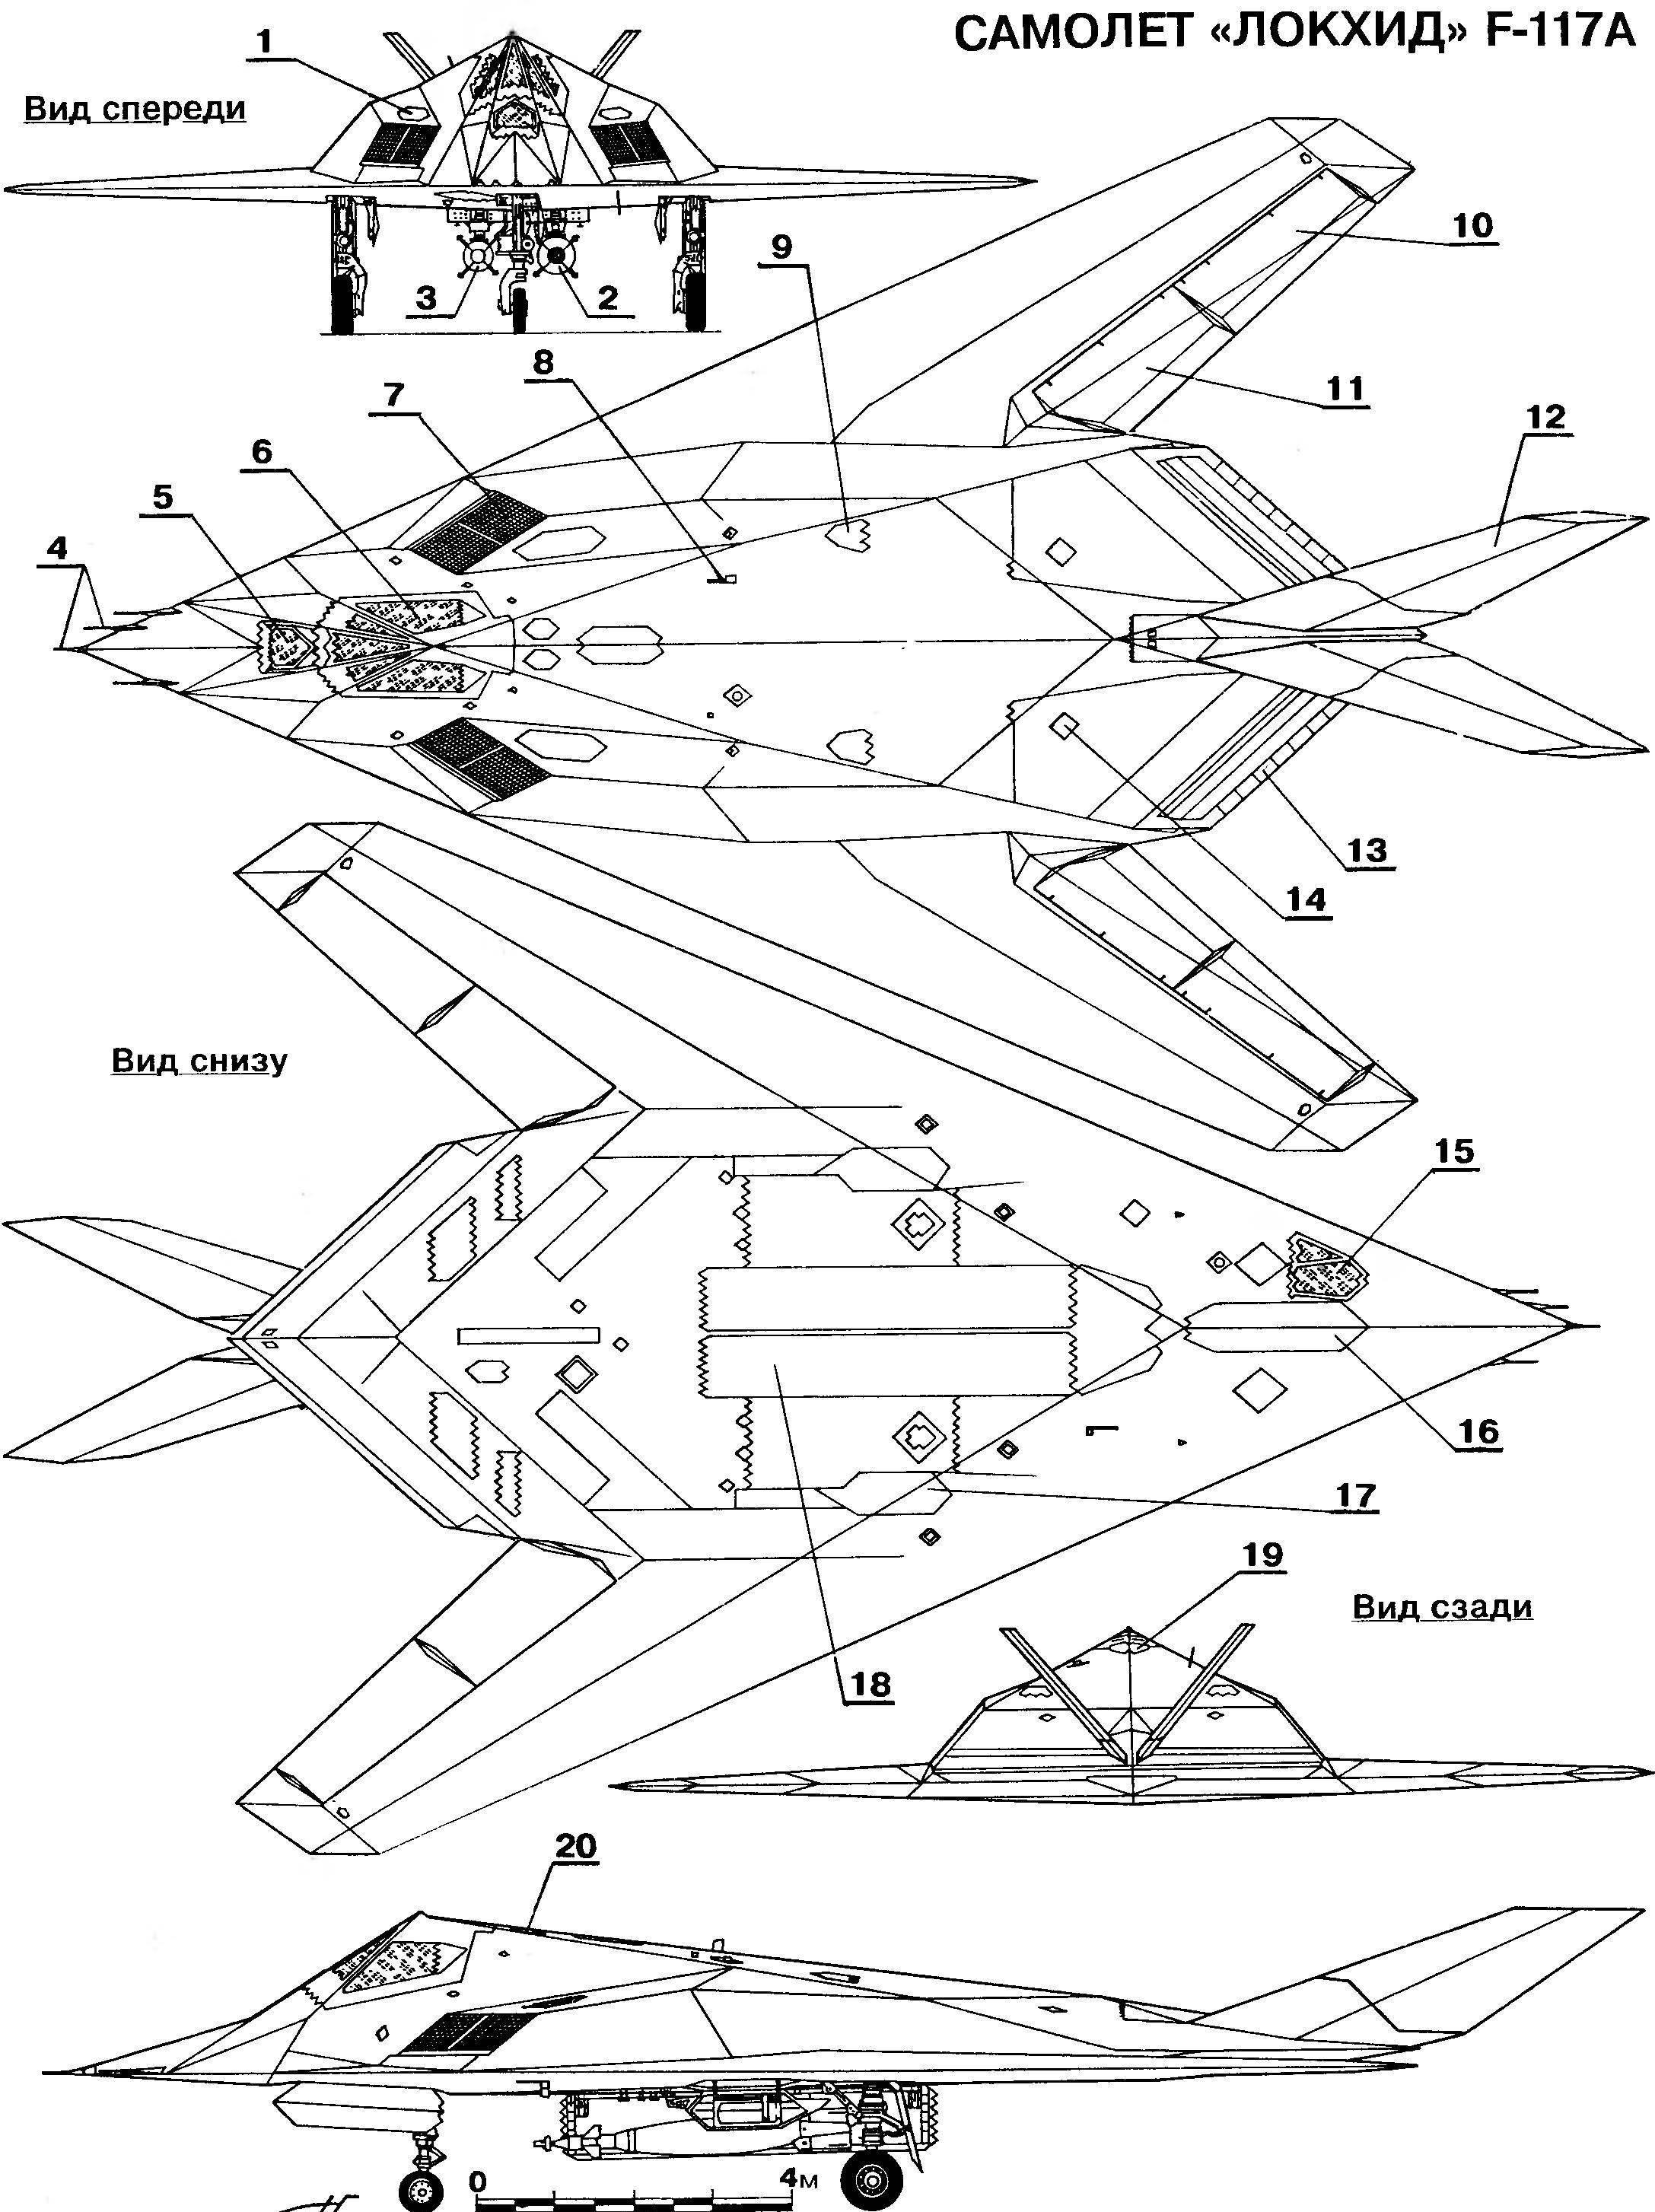 Самолет «Локхид» F-117А